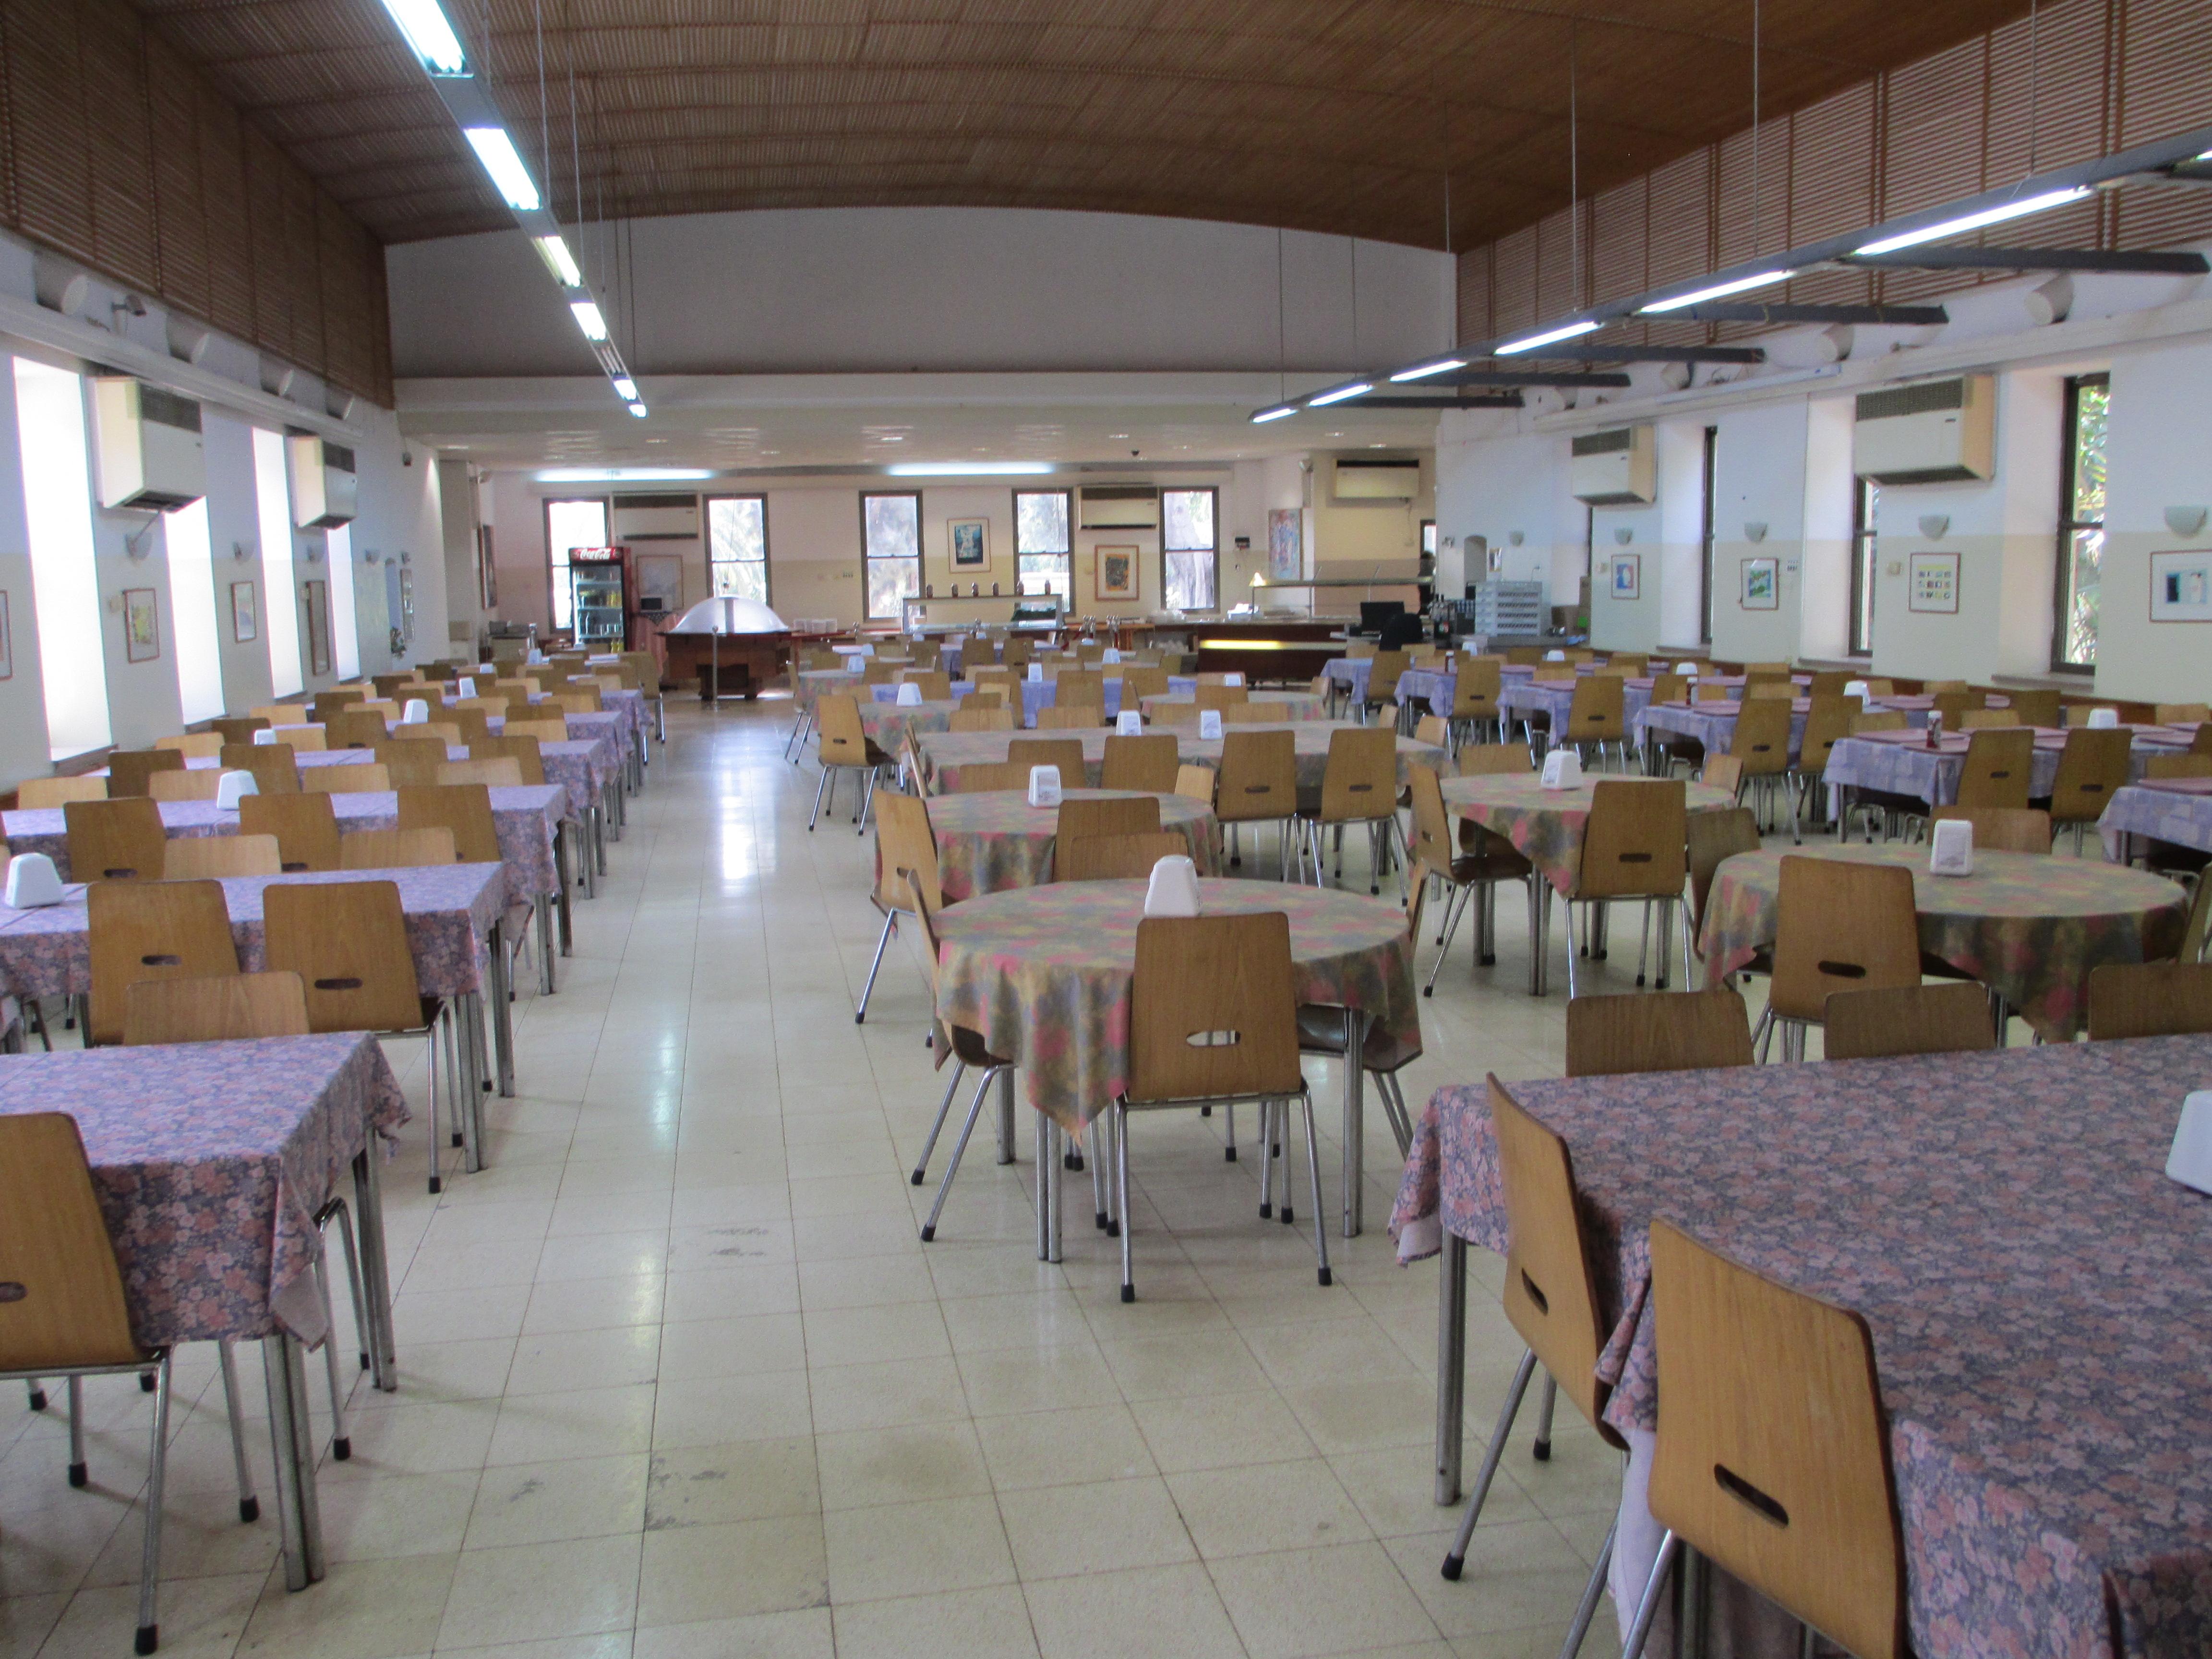 FilePikiWiki Israel 33588 Dining Room In Kibbutz ShefayimJPG